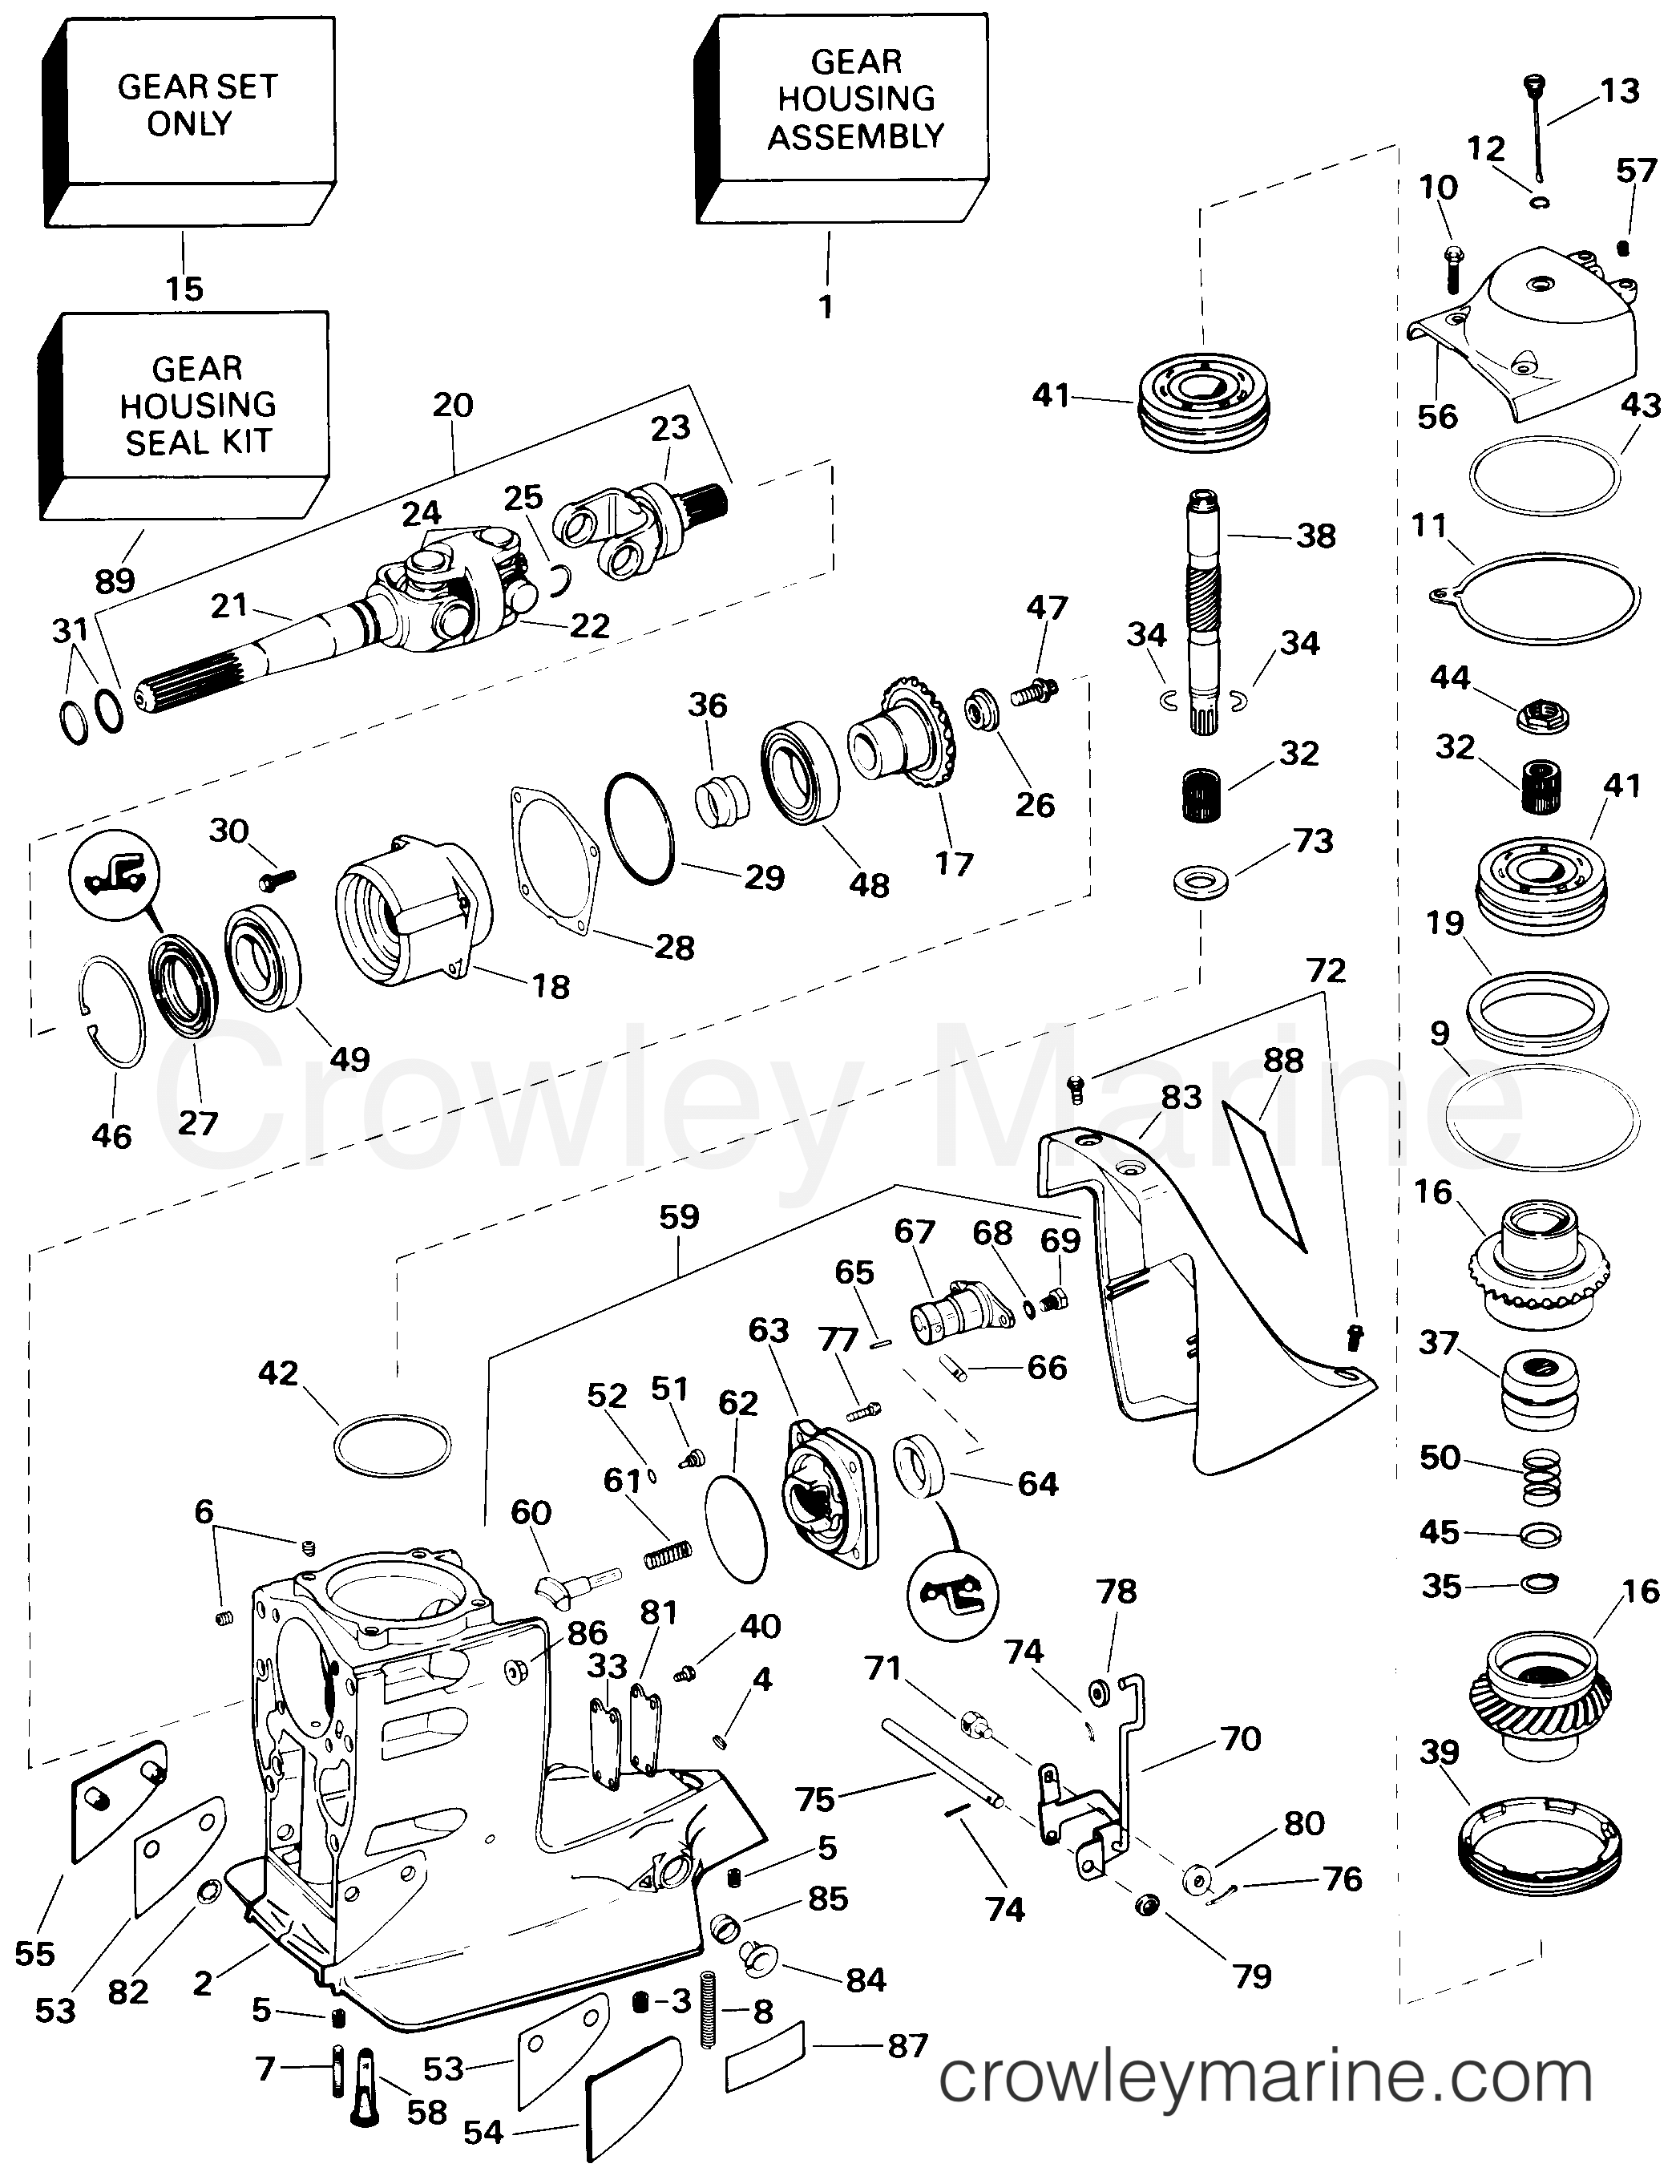 1998 OMC Stern Drive 5 - 50FBPBYC UPPER GEAR HOUSING section